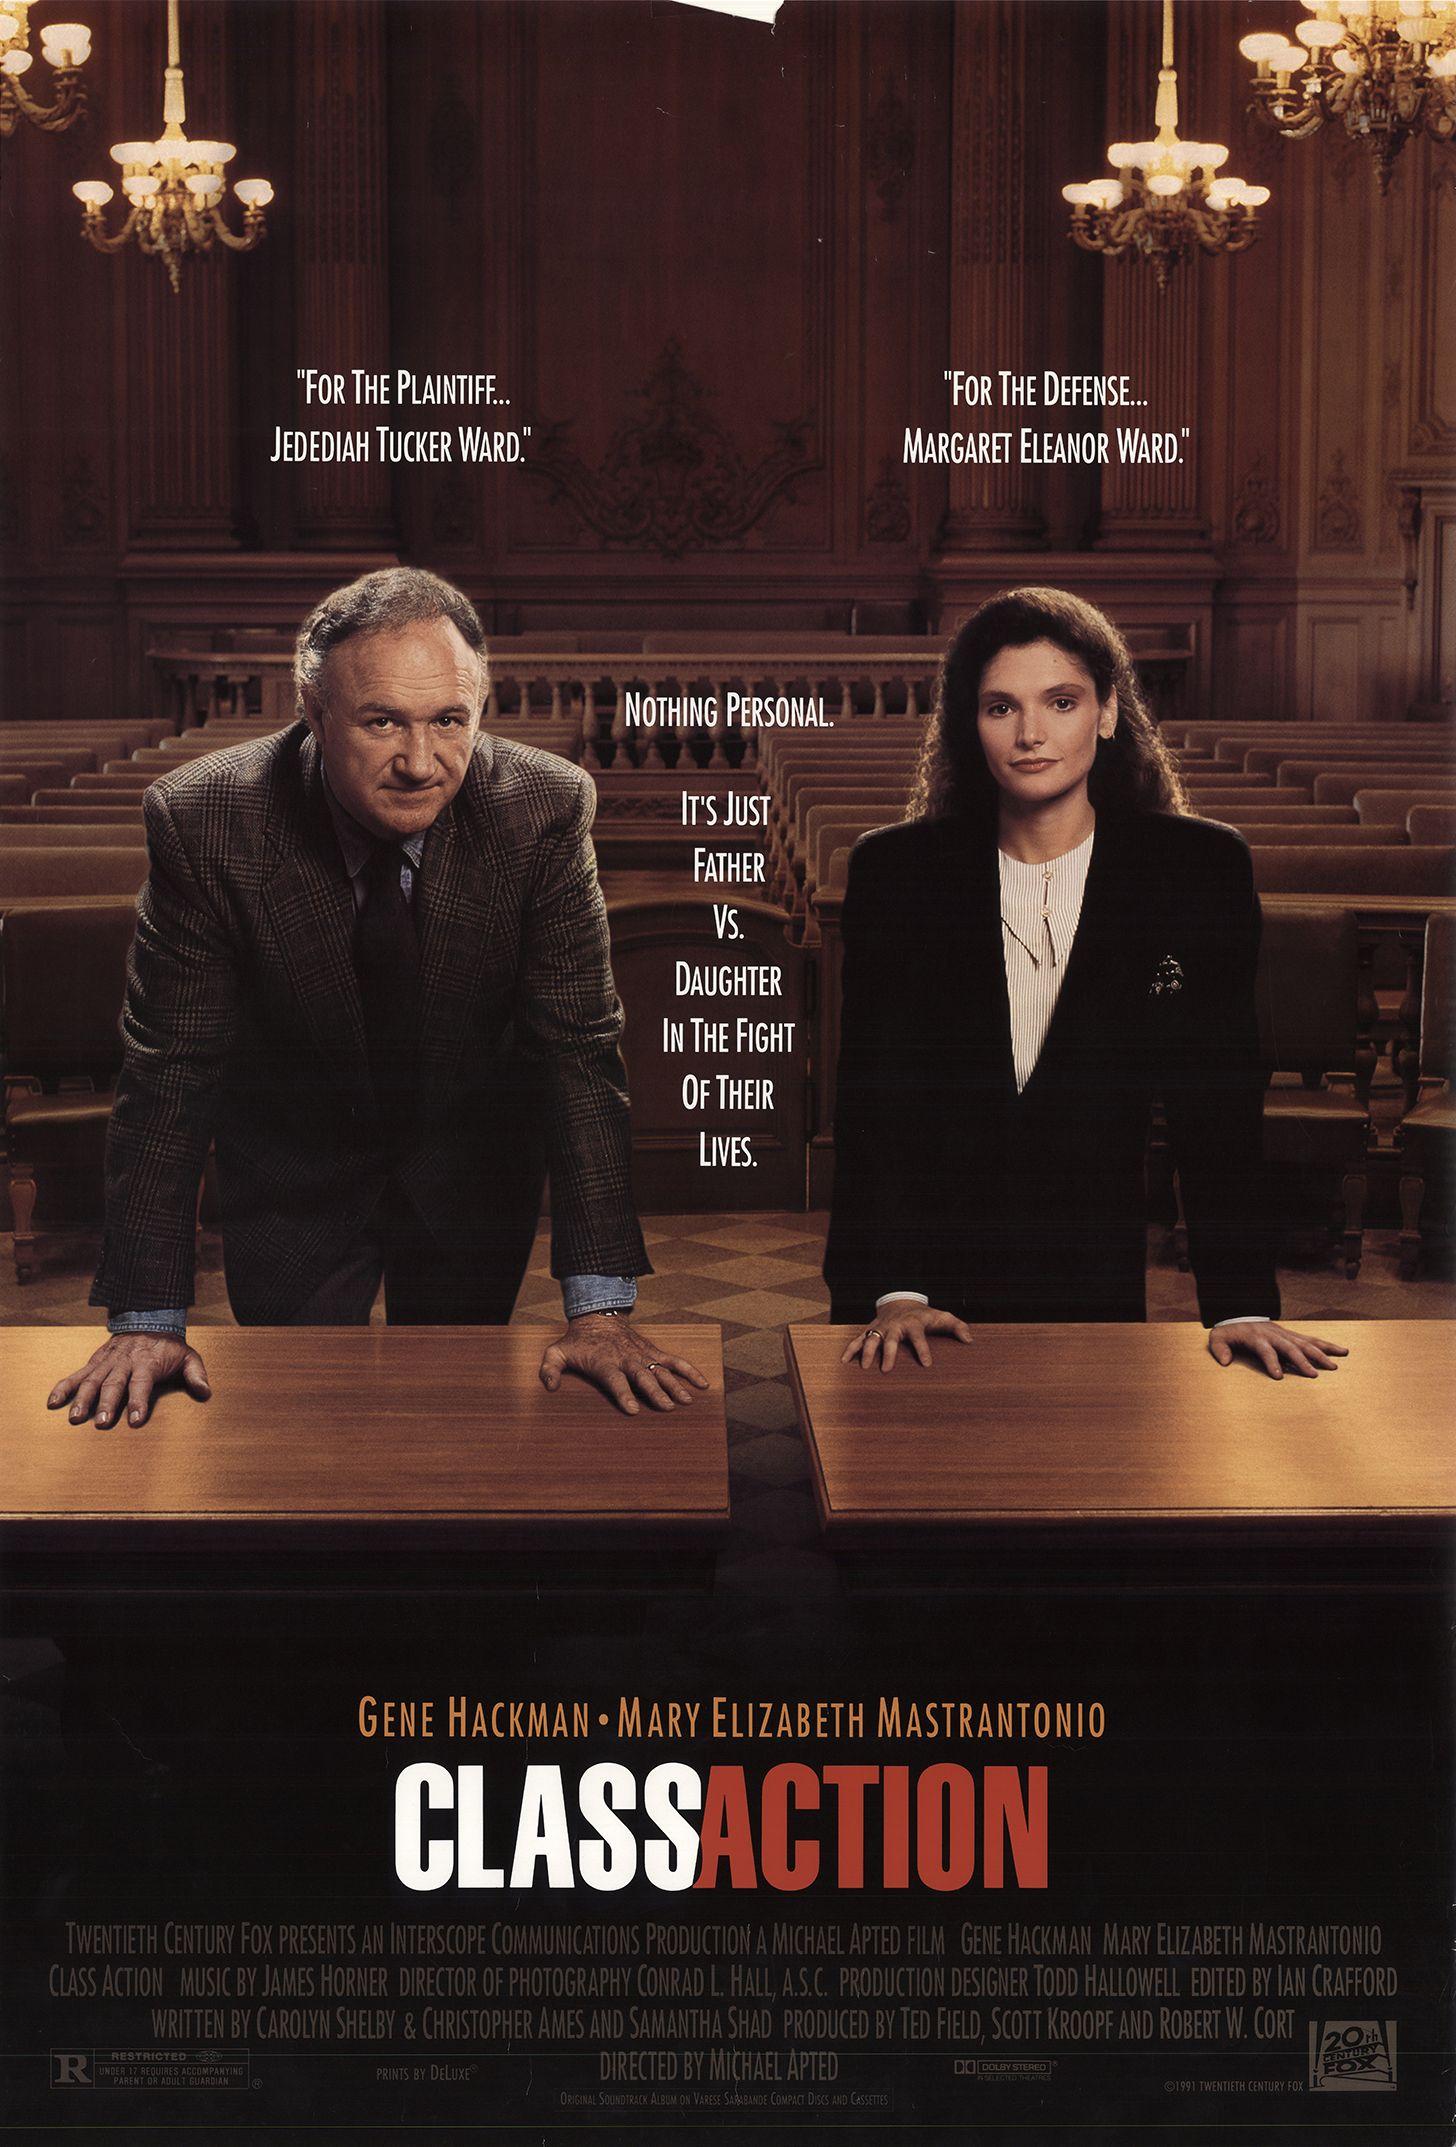 b19410efc5a07 Class Action (1991) - IMDb